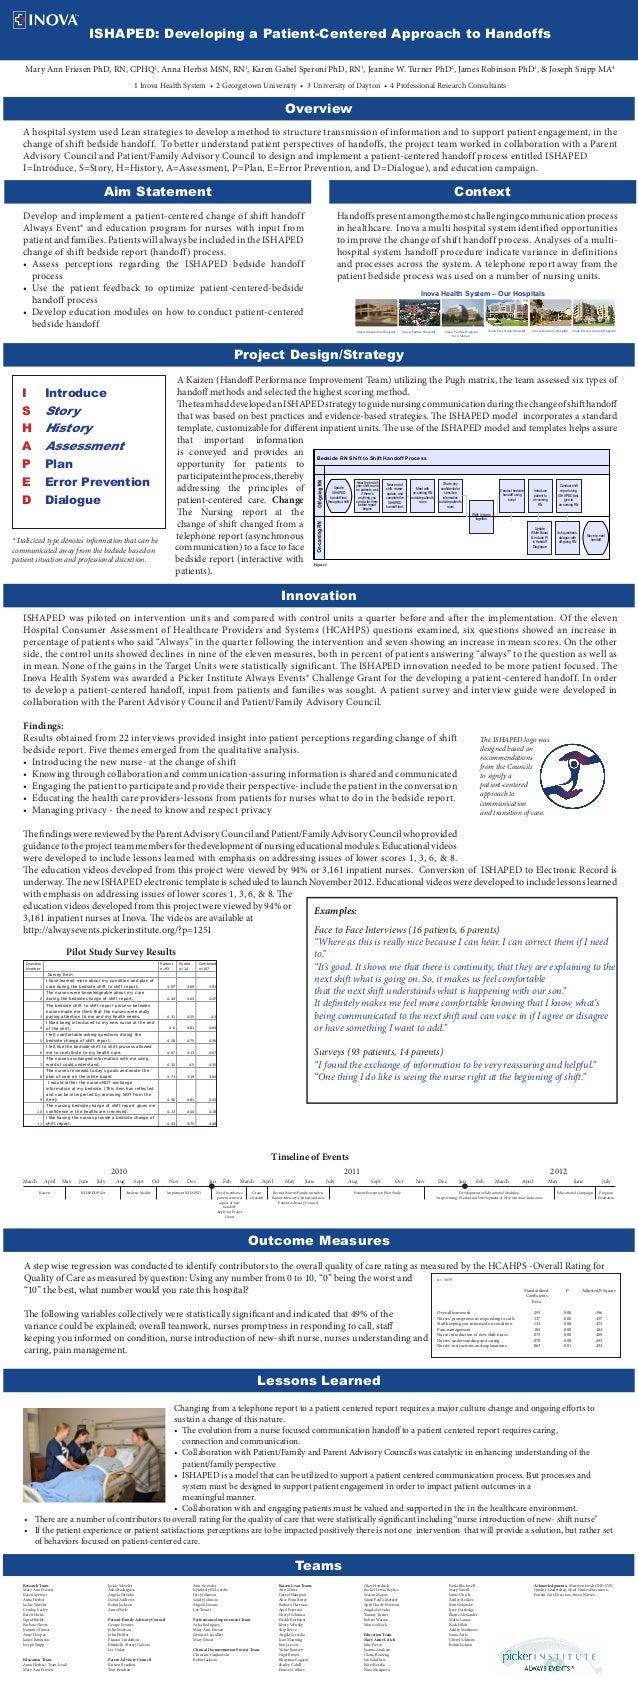 ISHAPED: Developing a Patient-Centered Approach to Handoffs    Mary Ann Friesen PhD, RN, CPHQ1, Anna Herbst MSN, RN1, Kare...